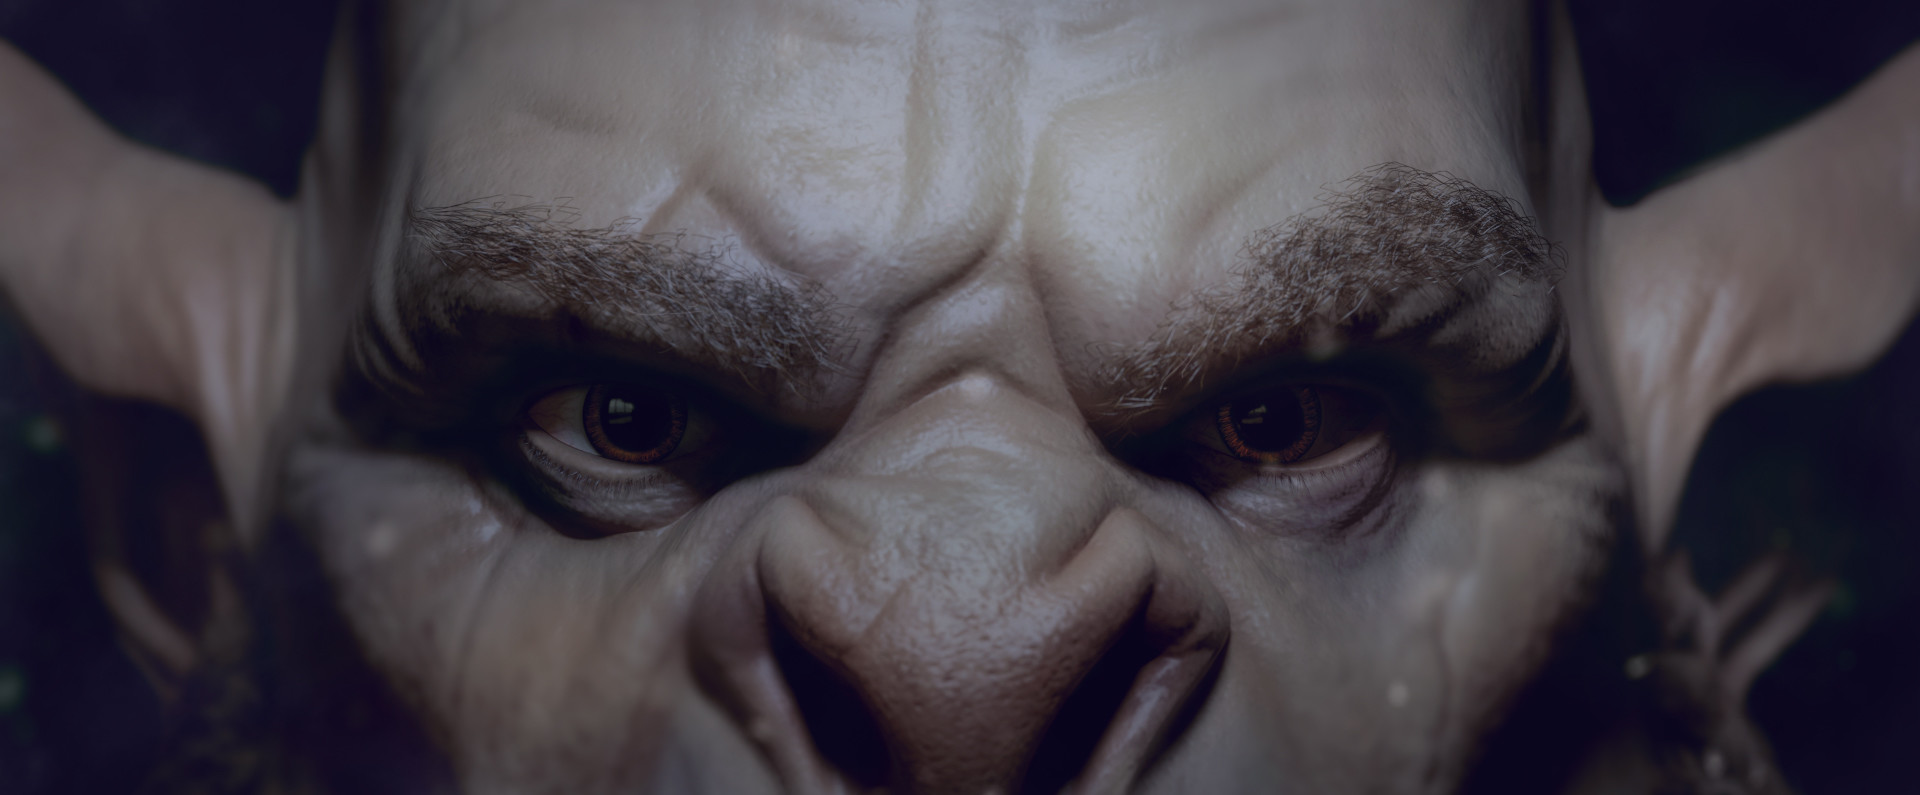 Rakan khamash orc eyes